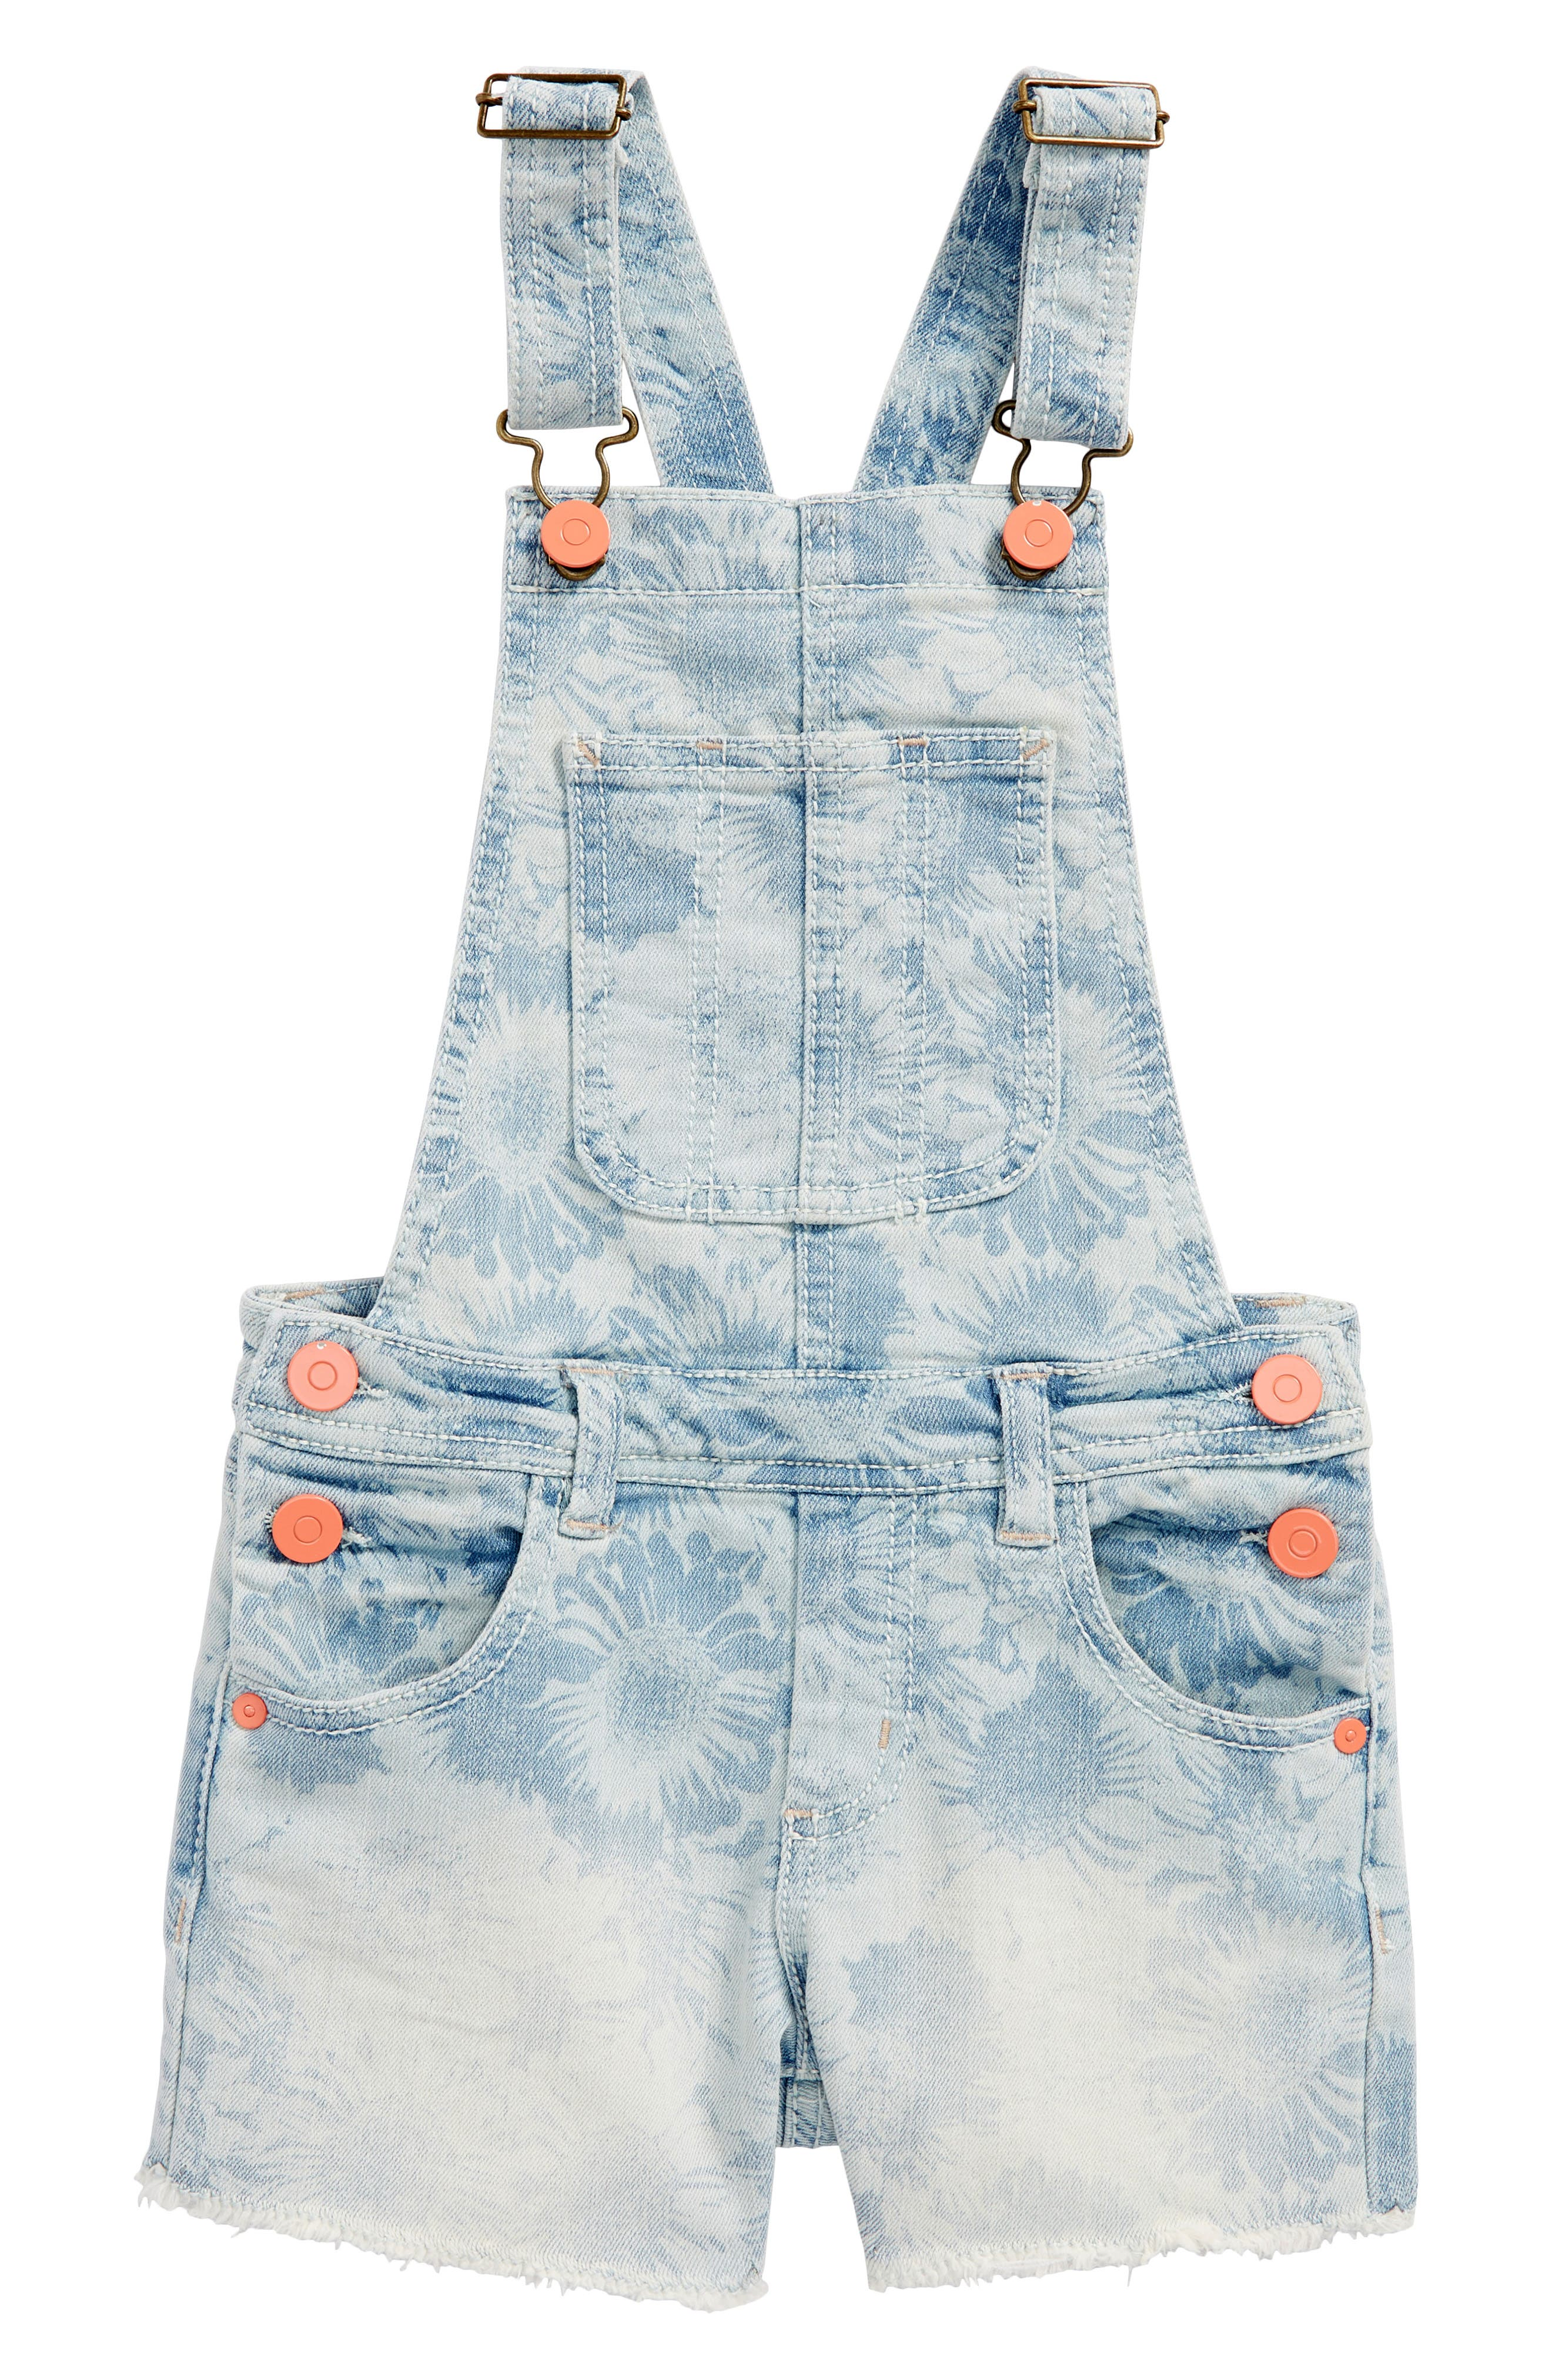 Daisy Cutoff Short Overalls,                         Main,                         color, Bleach